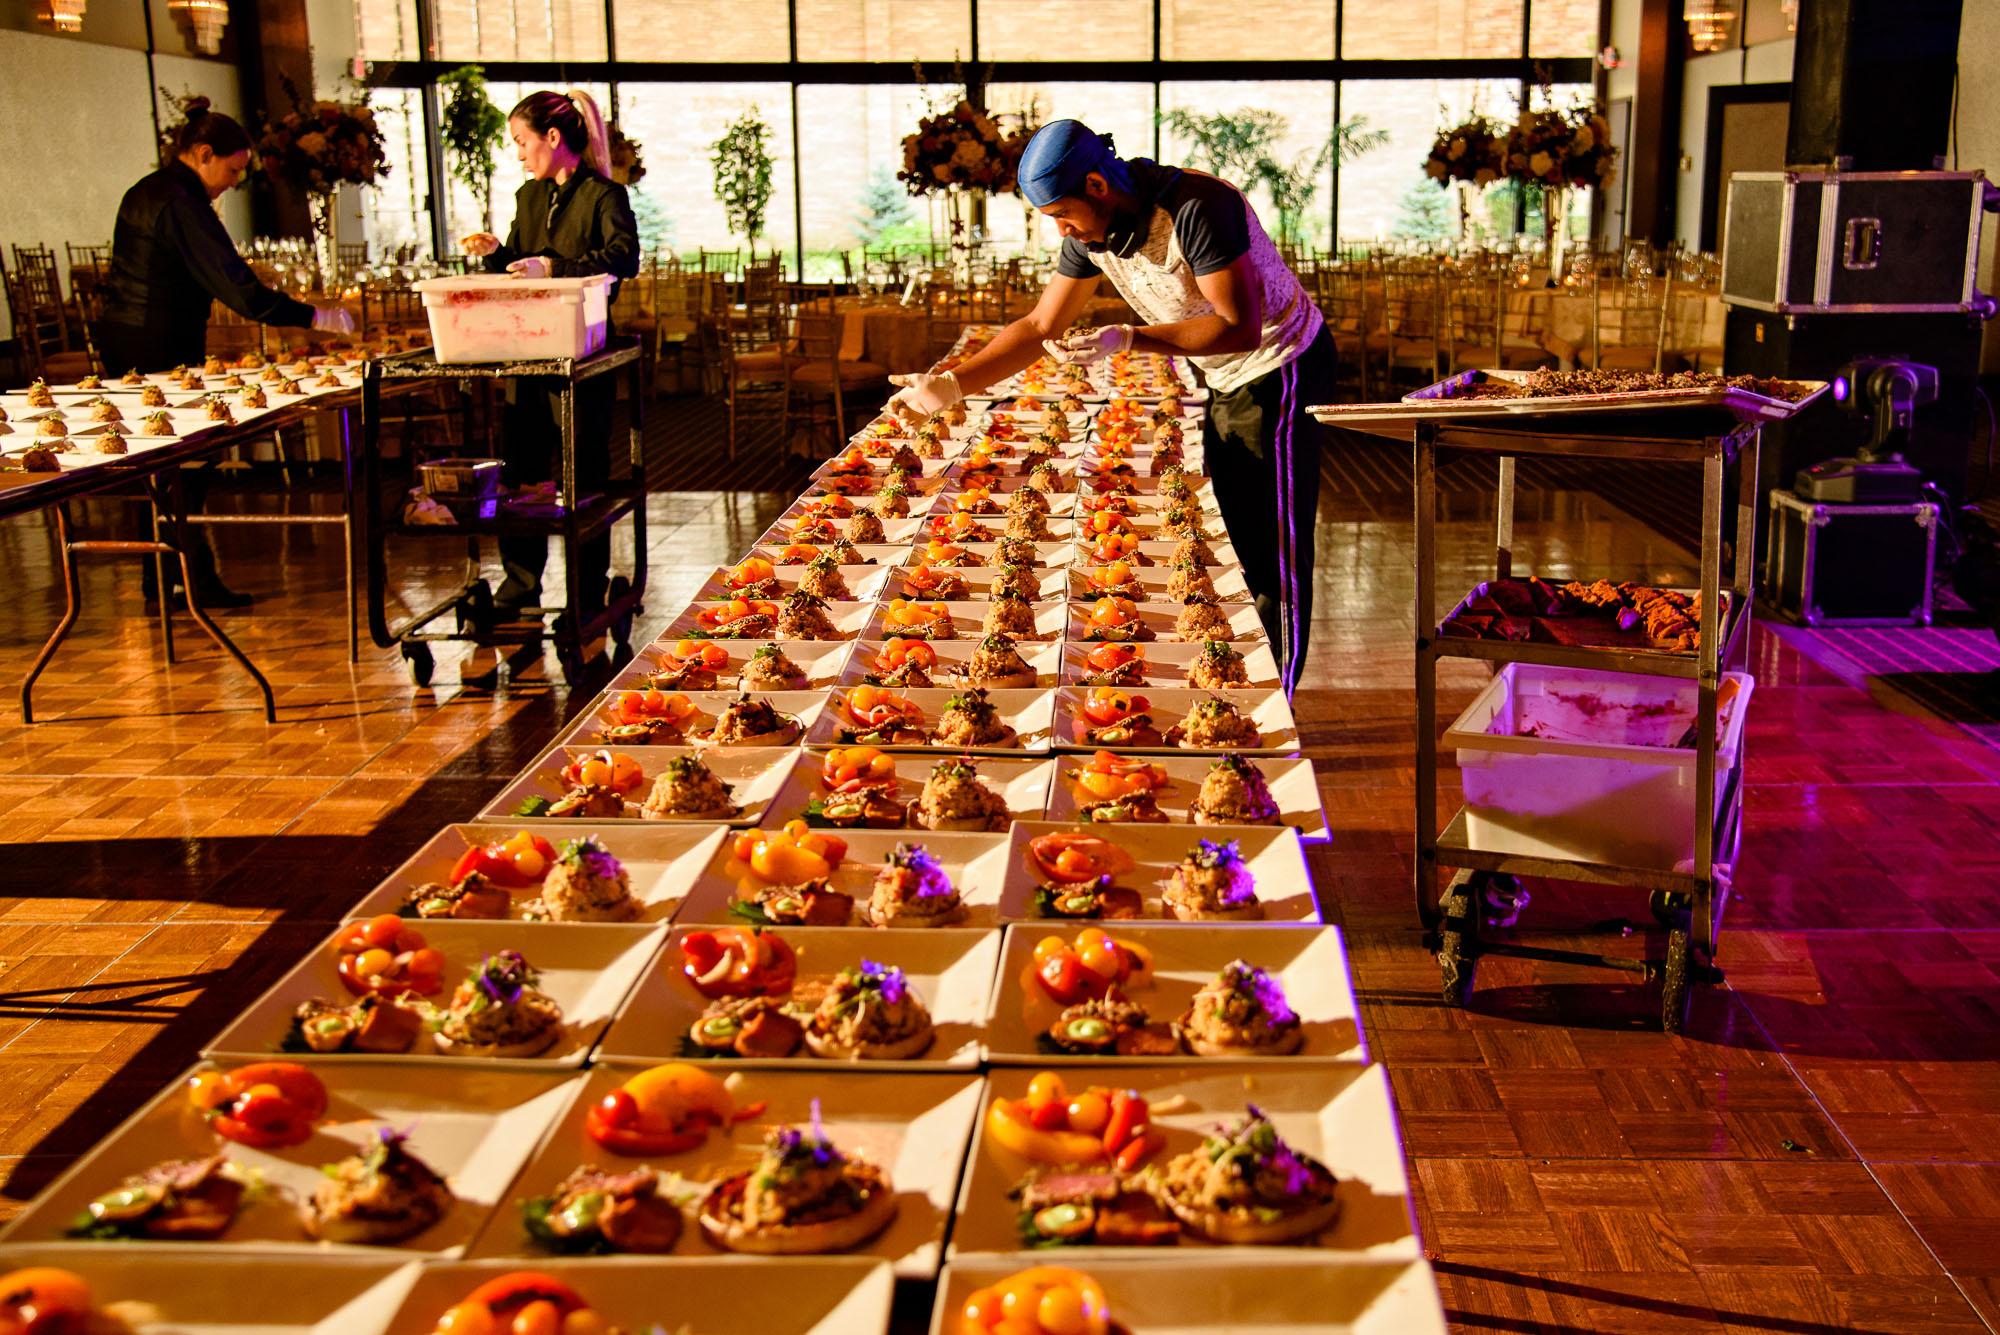 The Sephardic Temple reception preparations